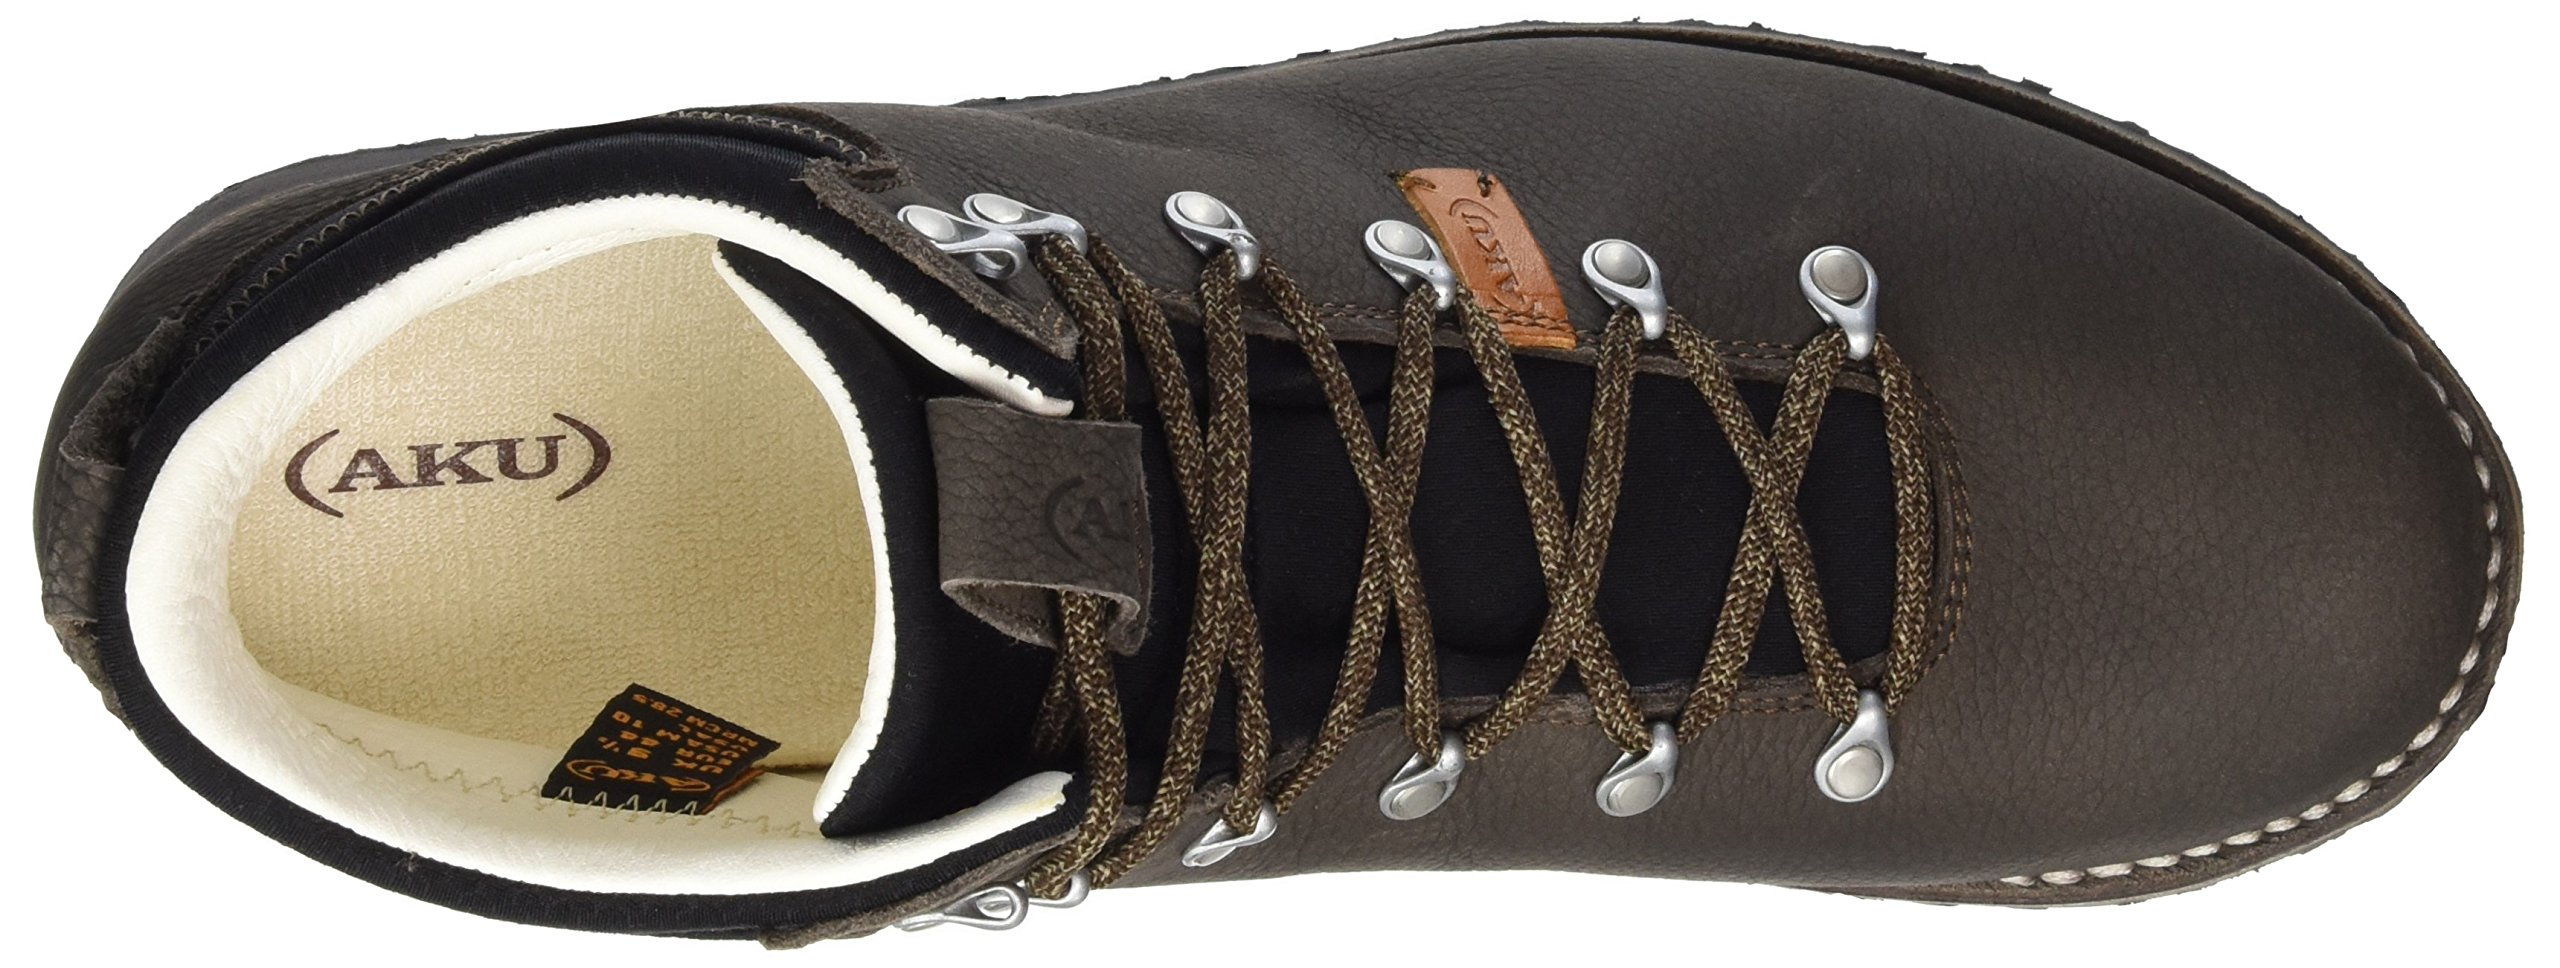 81MgHn7NMOL - AKU Unisex Adults' Badia Plus High Rise Hiking Boots